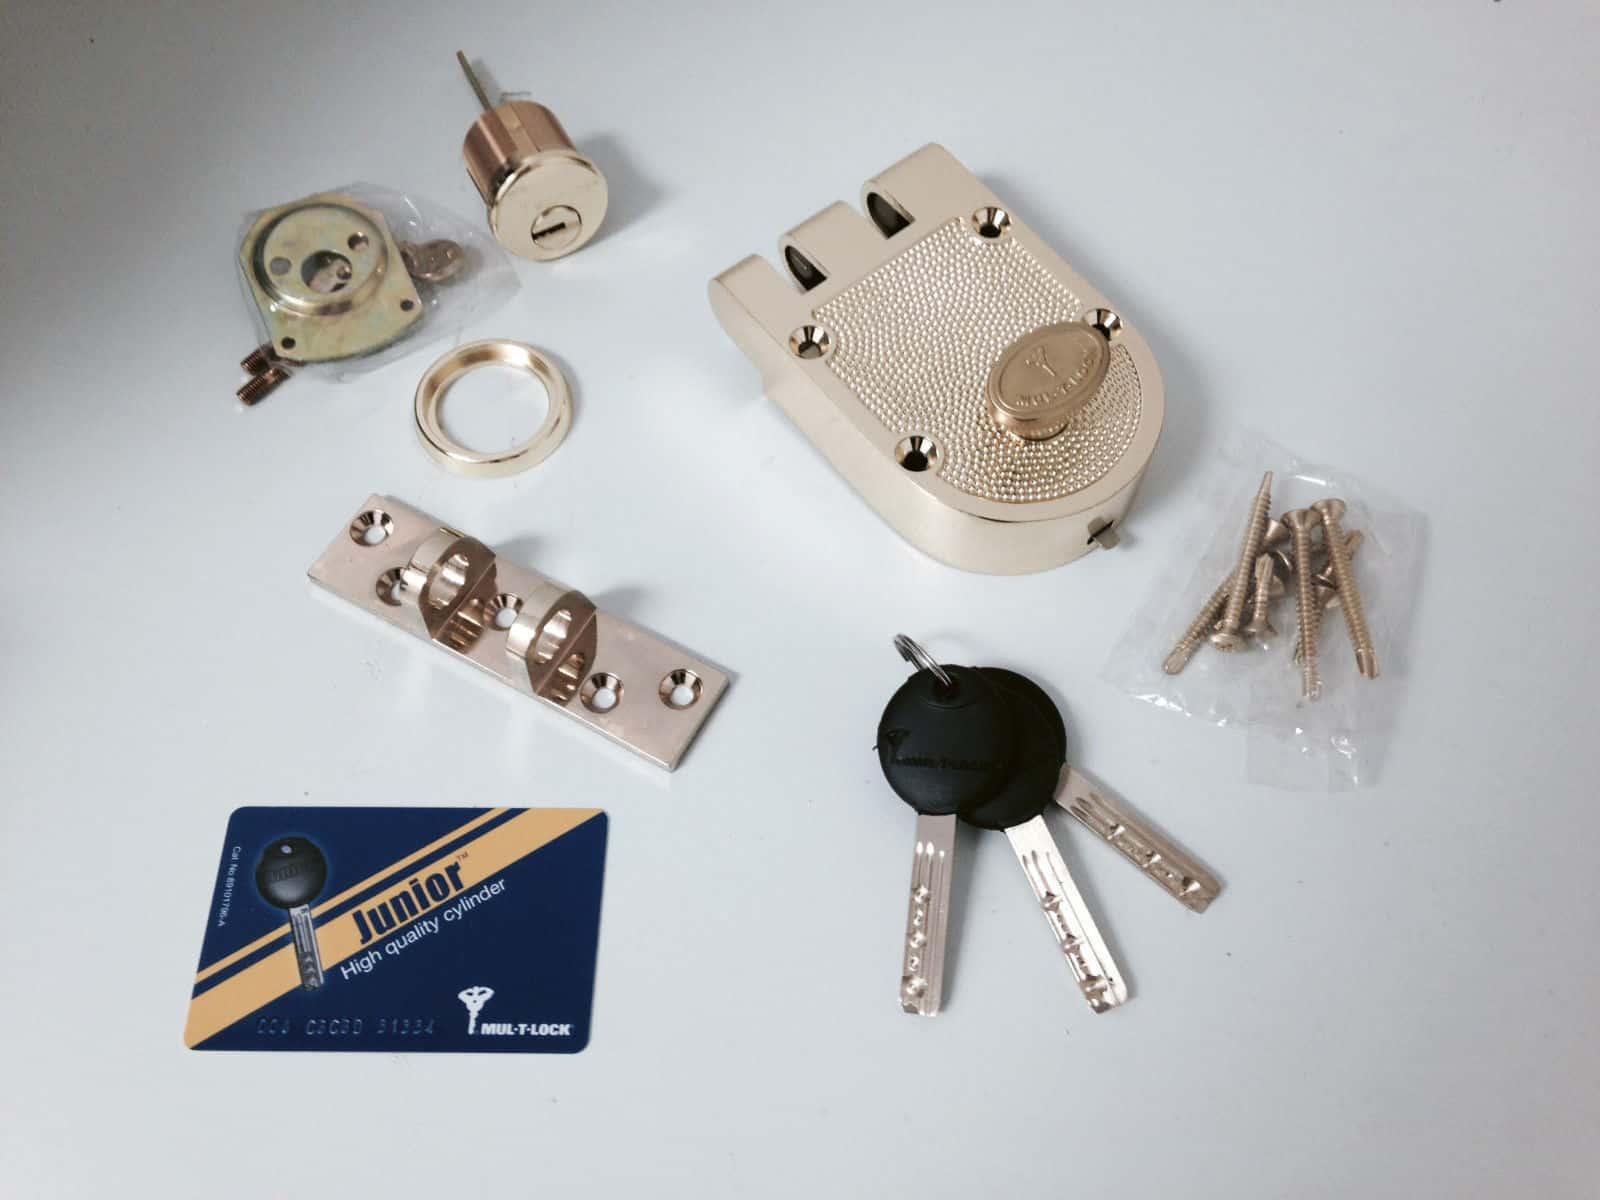 Finding A Locksmith